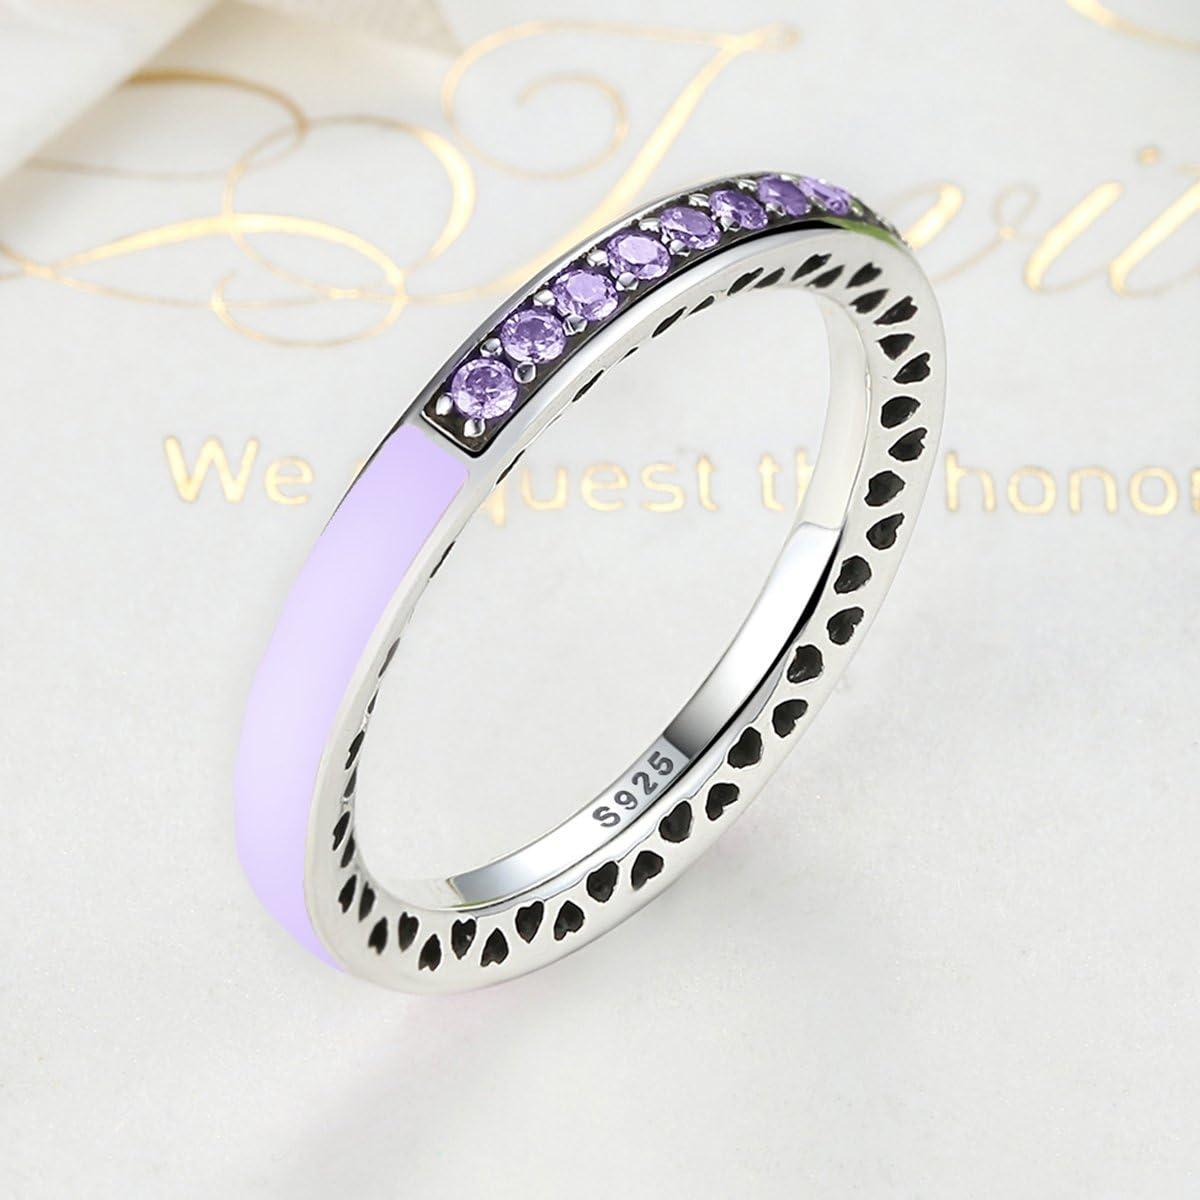 The Kiss Radiant Hearts 925 Sterling Silver Stackable Ring Lavender Enamel Enamel /& CZ